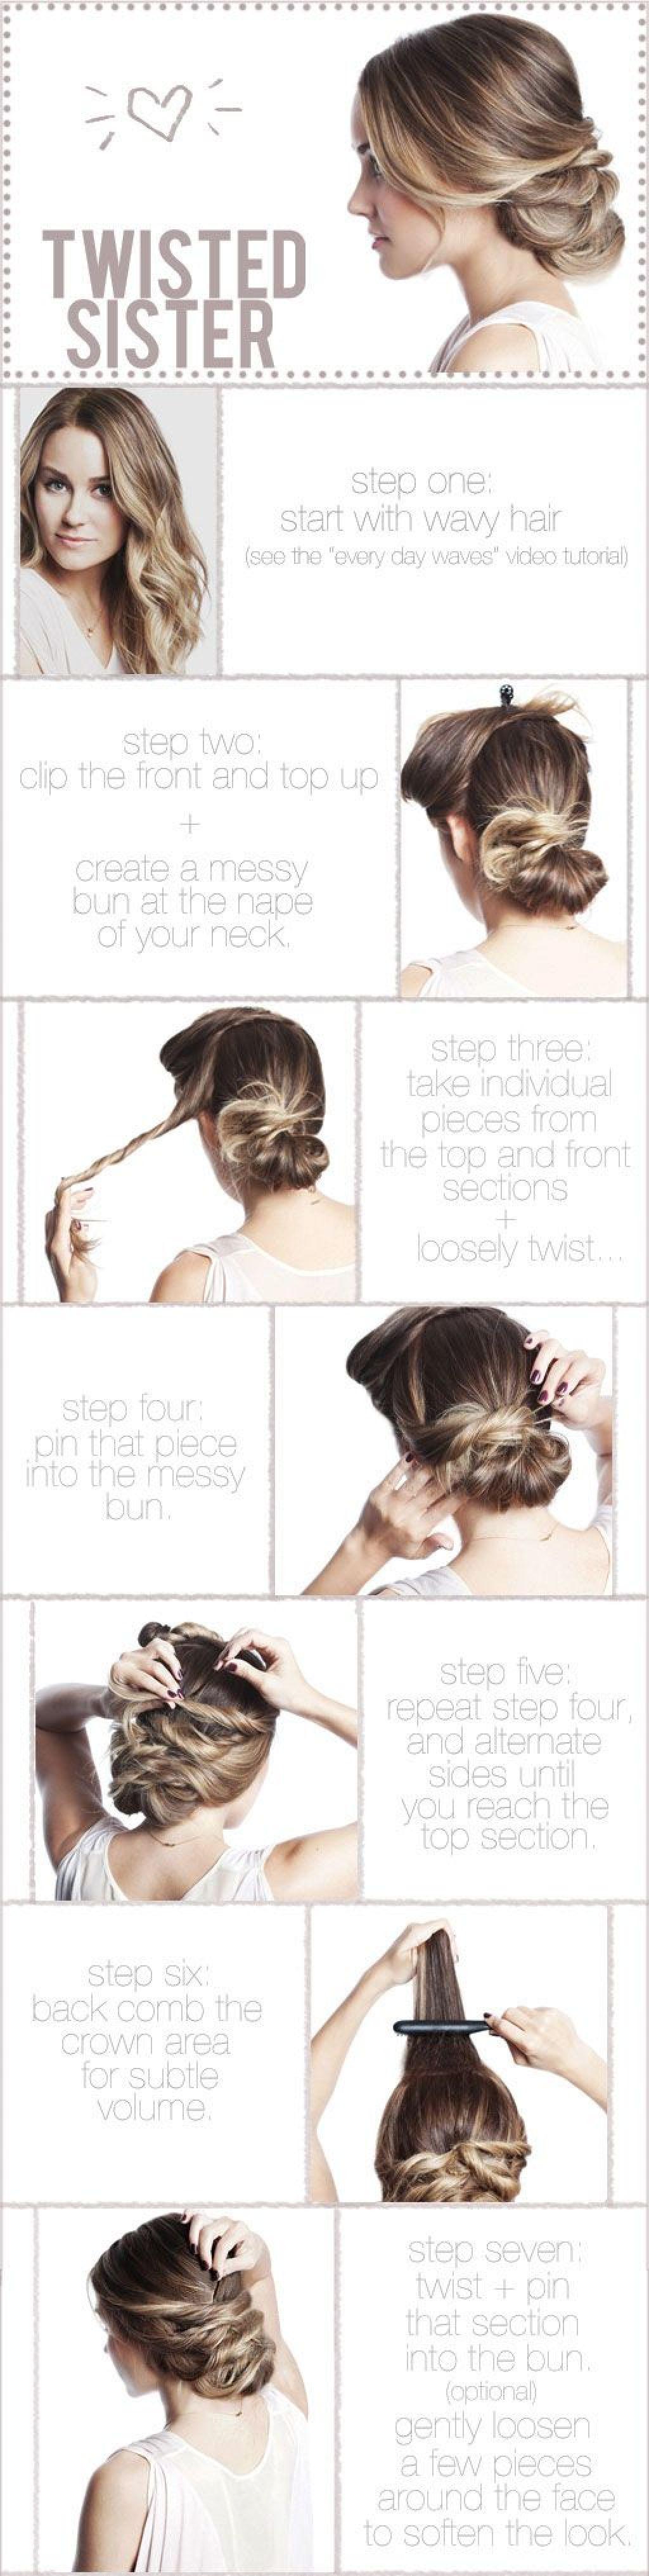 Pre Wedding DIY Bridal Hairstyles Tutorials | Hair Help | Pinterest ...